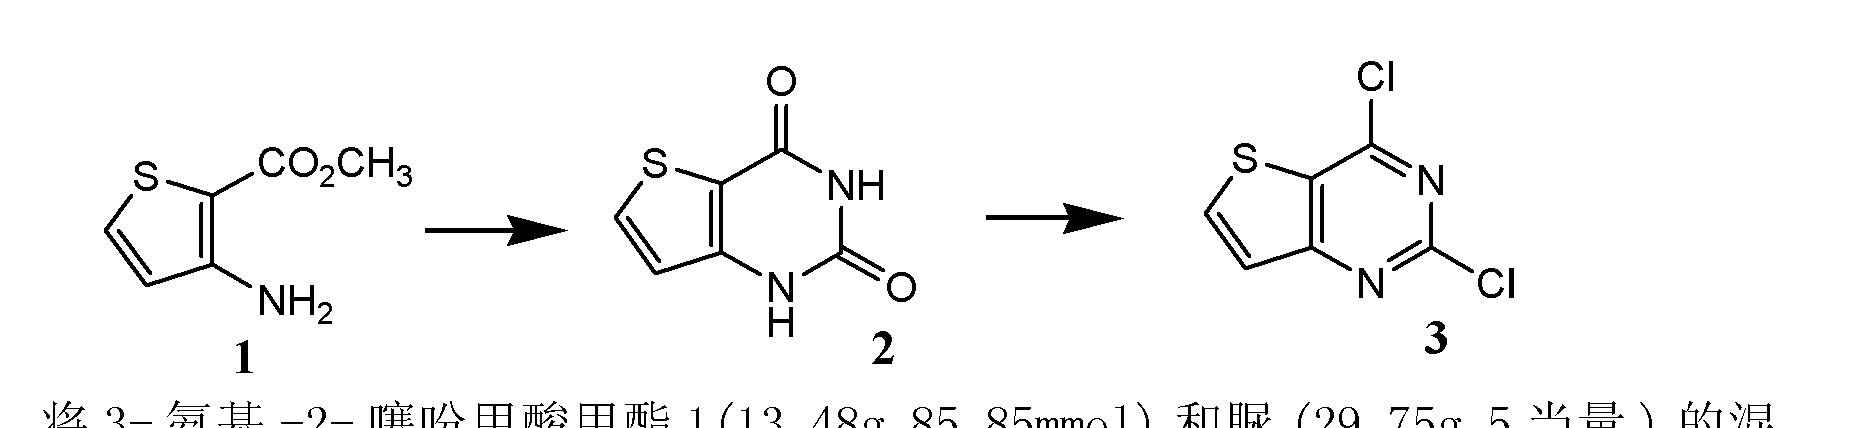 Figure CN102369011AD00752